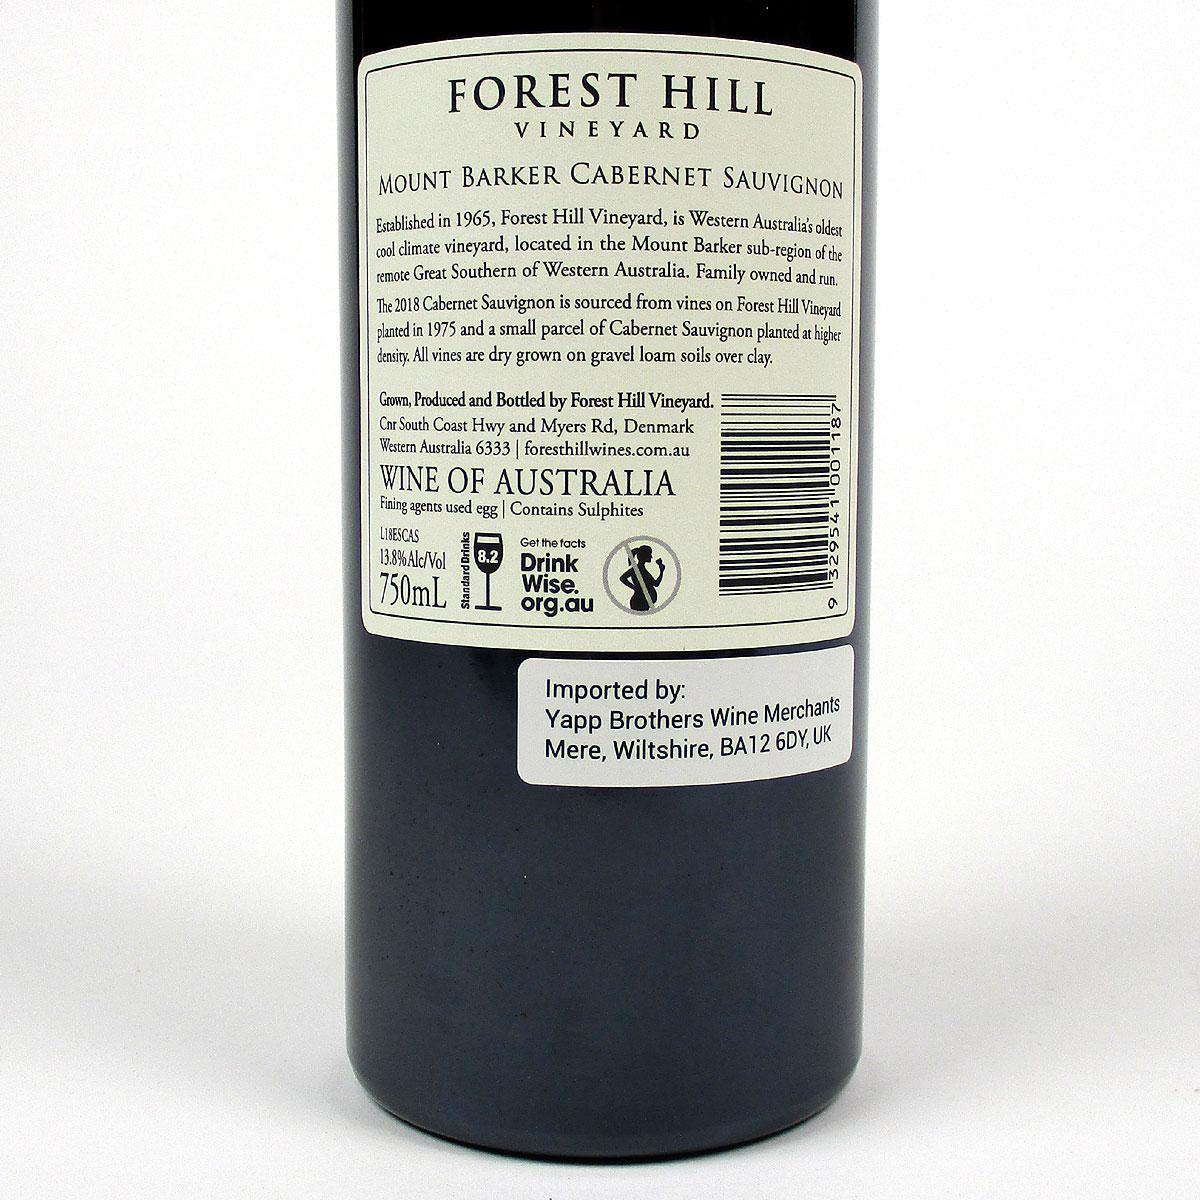 Forest Hill Vineyard: 'Estate' Cabernet Sauvignon 2018 - Bottle Rear Label